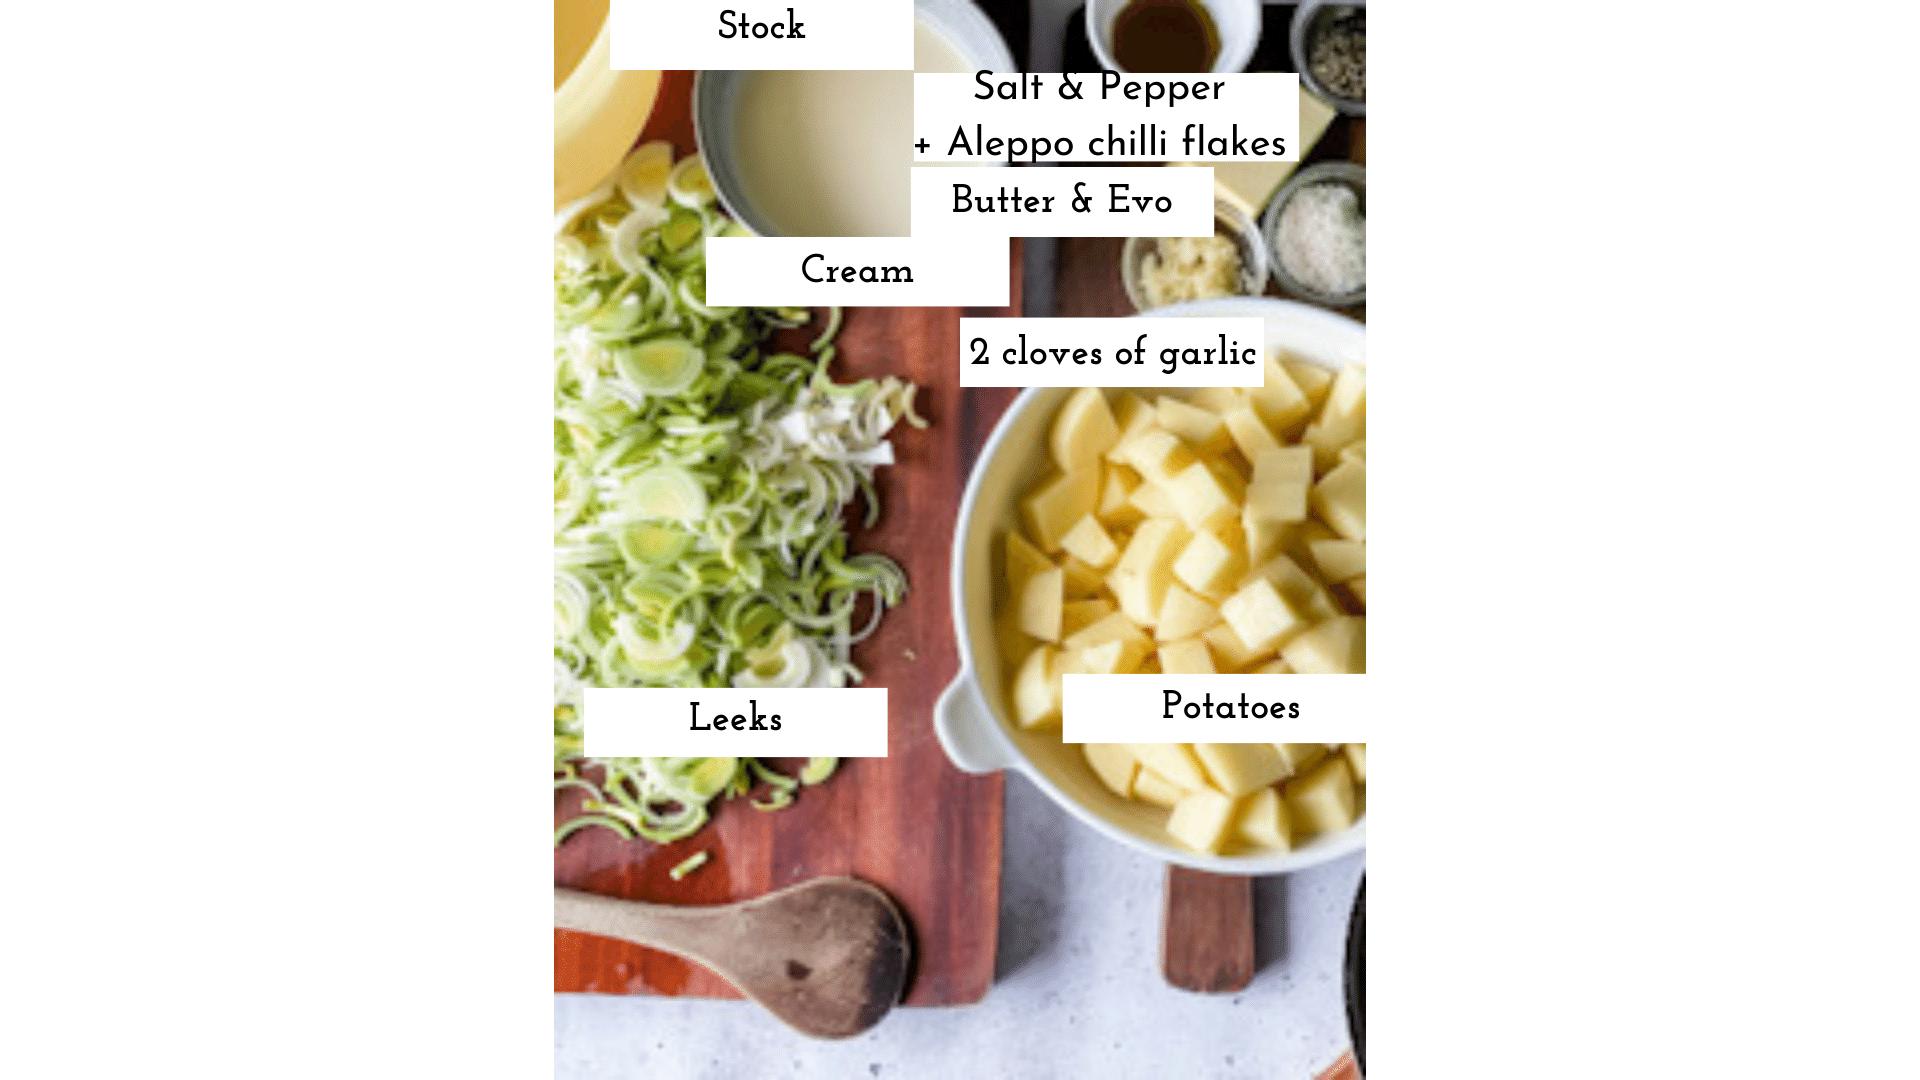 Potato and Leek Soup, Potato and Leek Soup